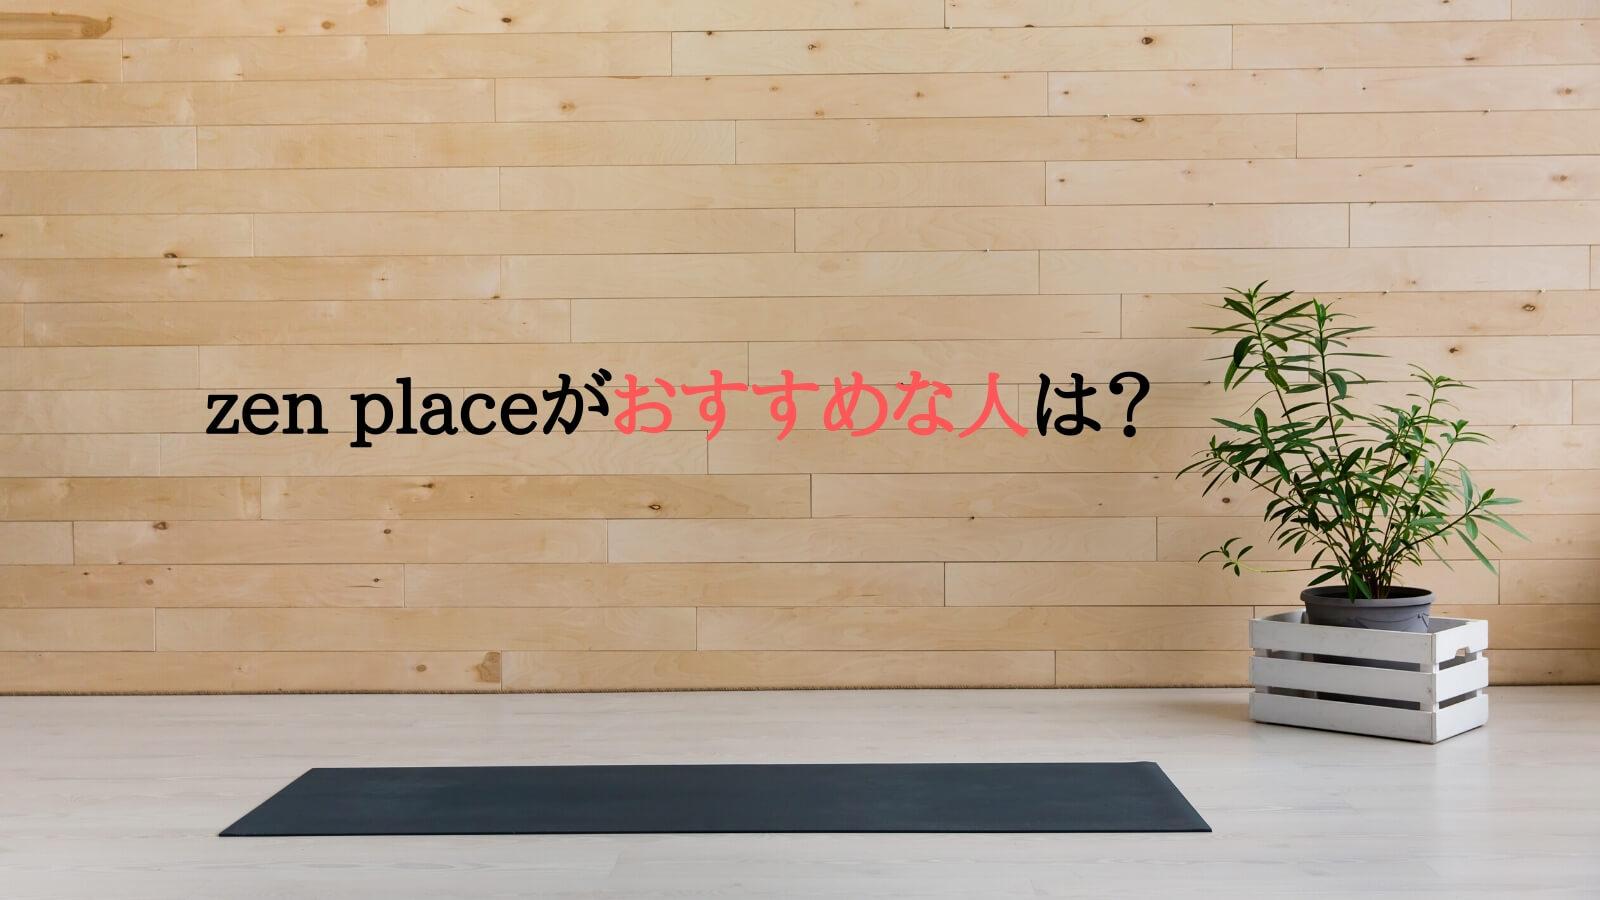 zen place(旧ヨガプラス)がおすすめな人は?